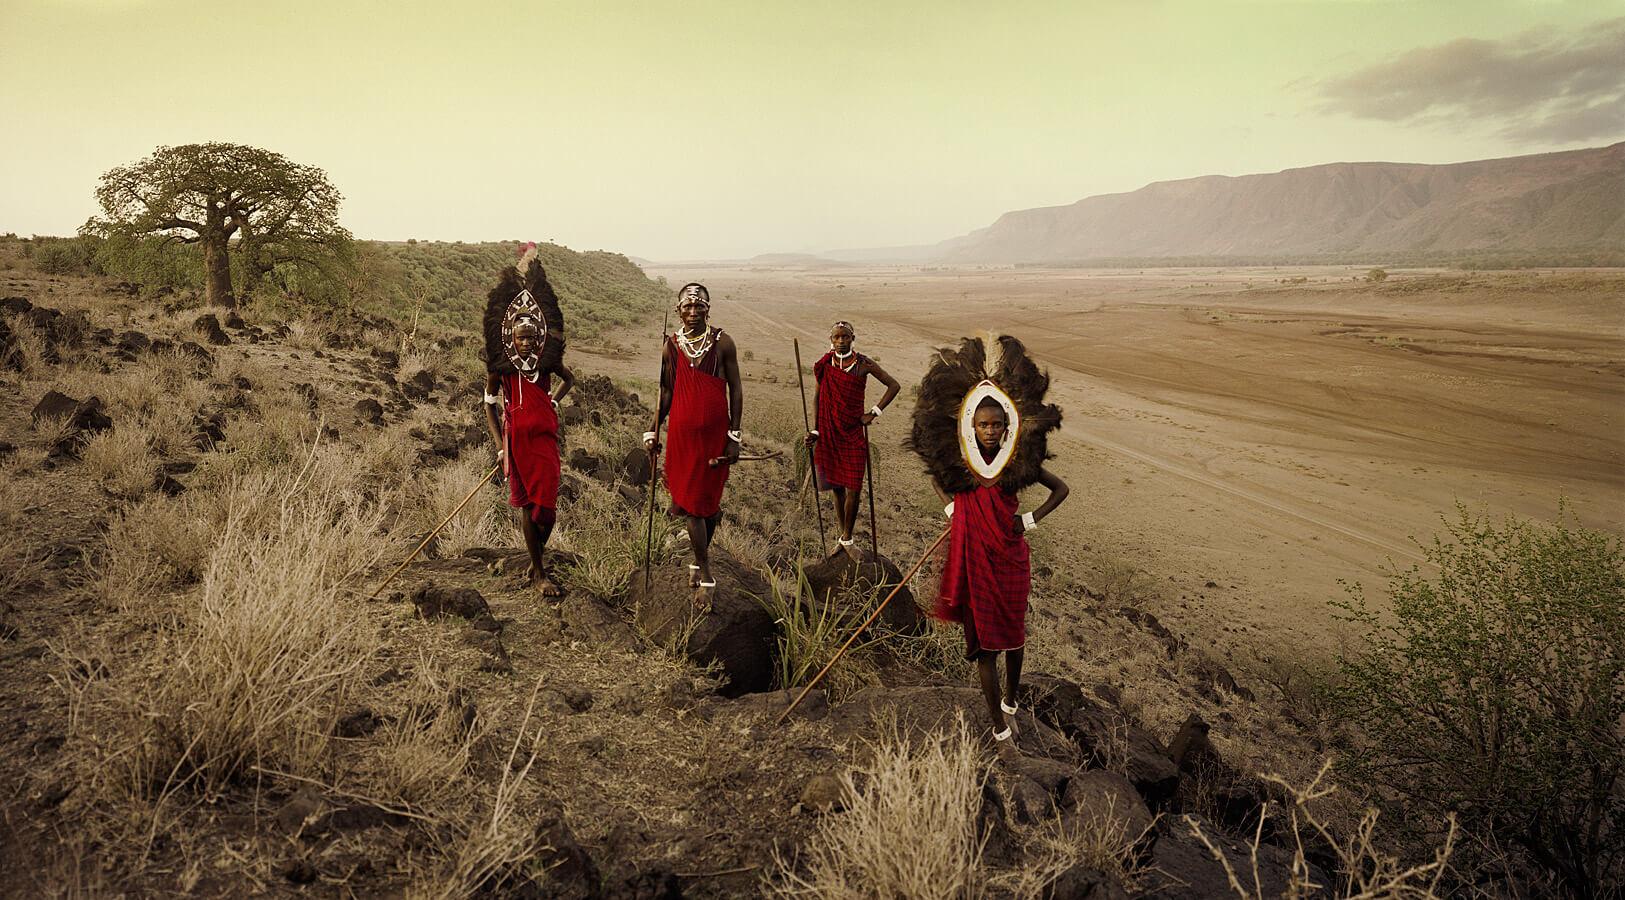 predstaviteli-plemeni-na-fone-svoih-vladenij